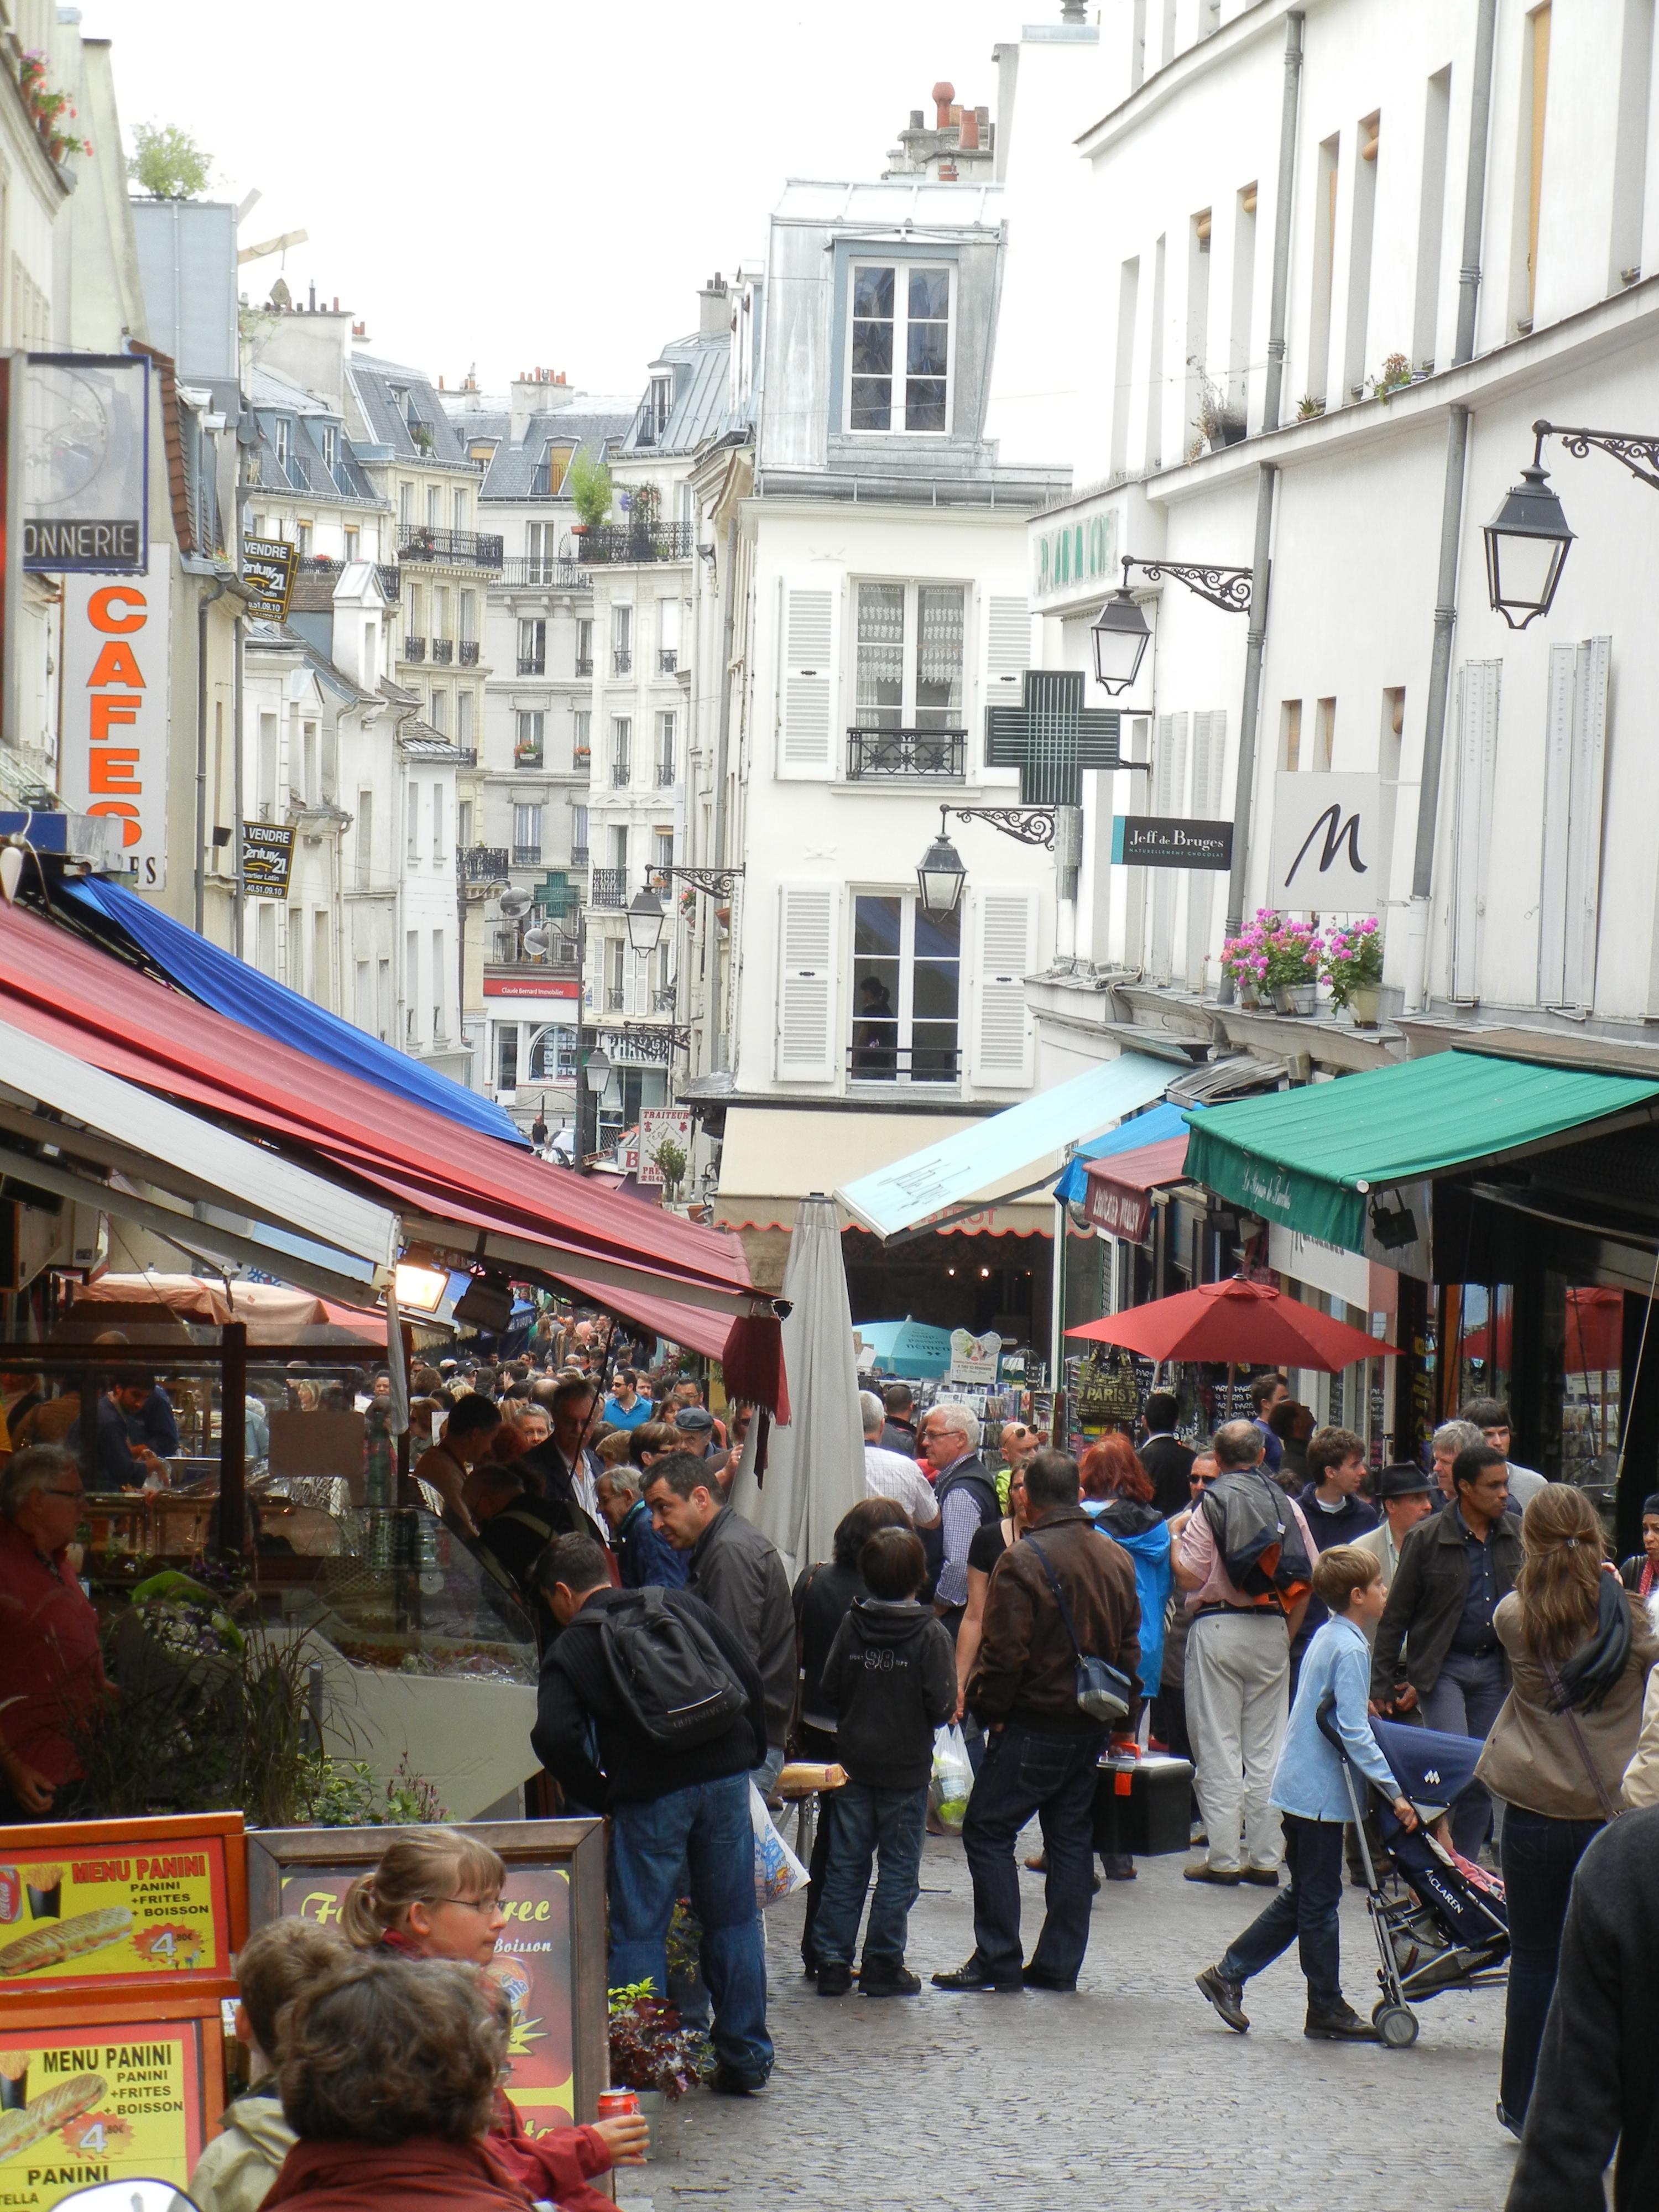 Rue Mouffetard Market Street Paris  marjorierwilliamscom